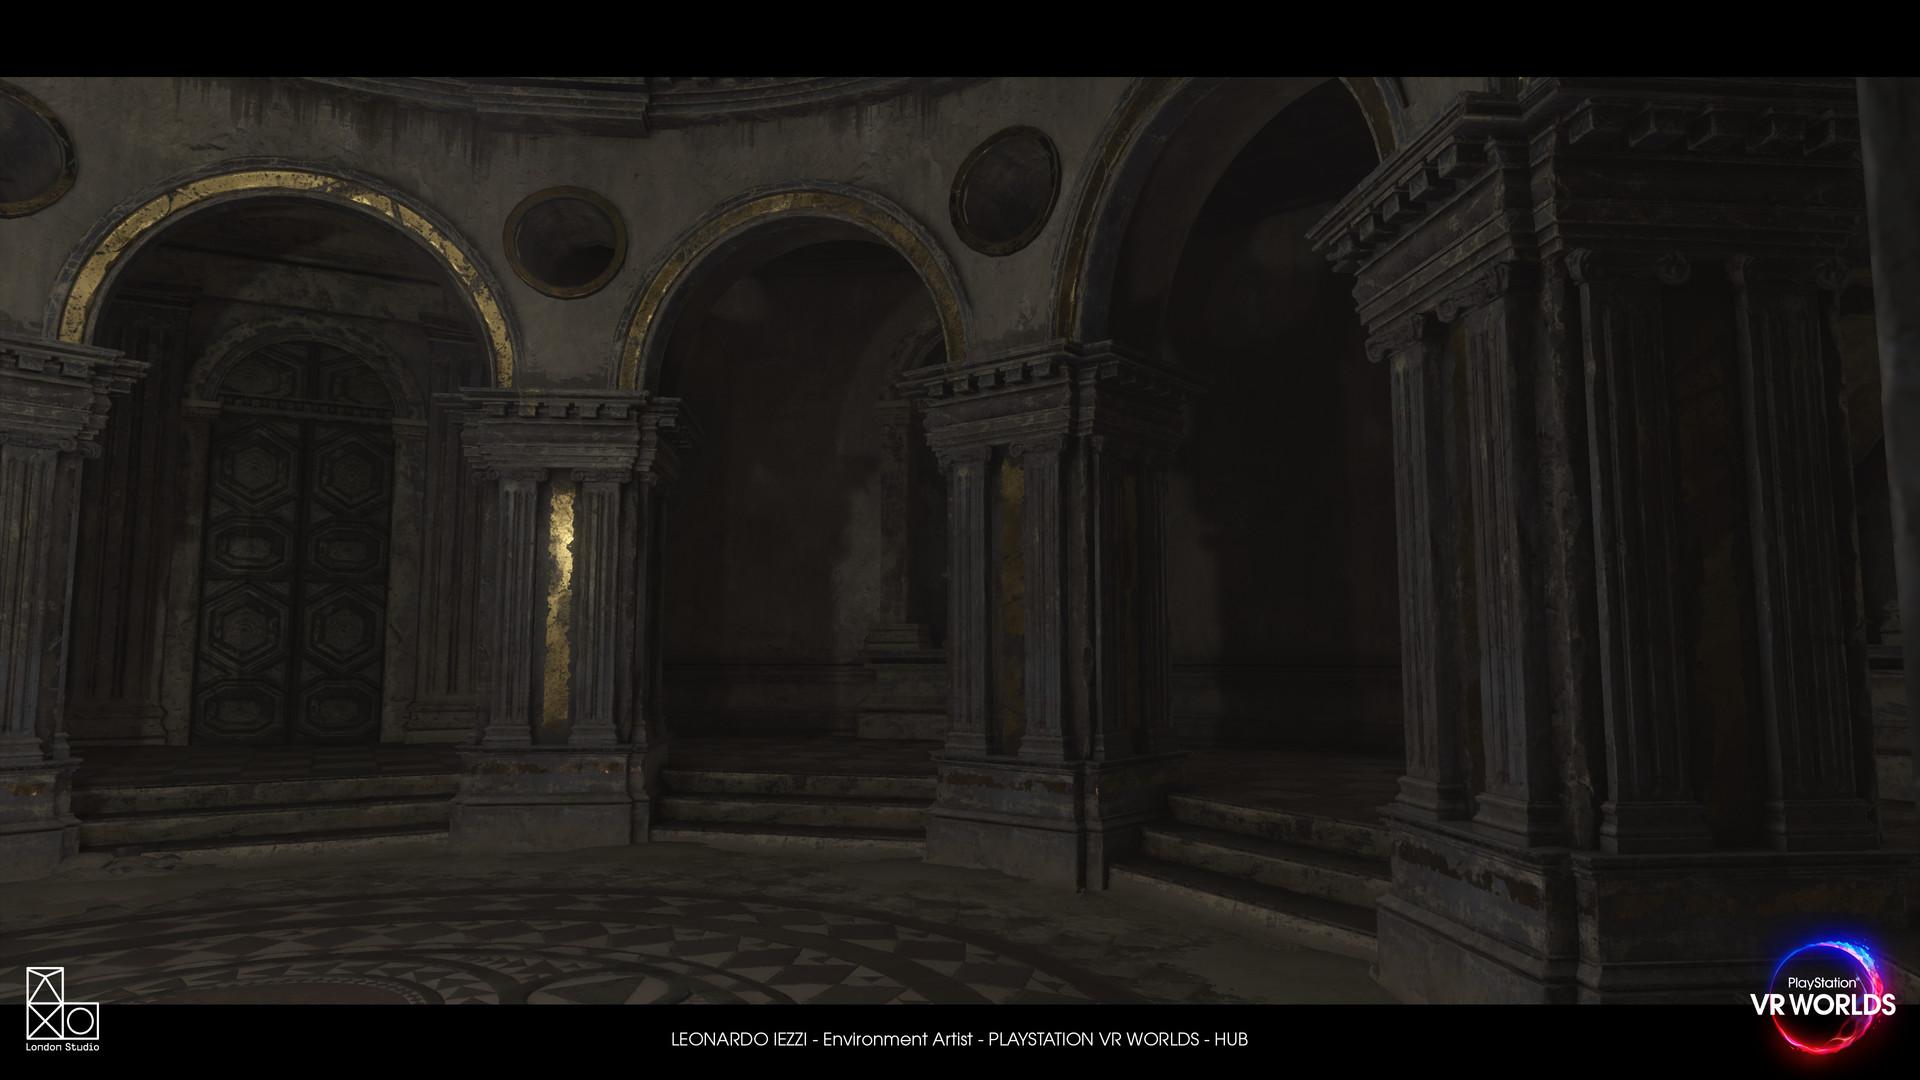 Leonardo iezzi leonardo iezzi environment artist vr worlds hub 03